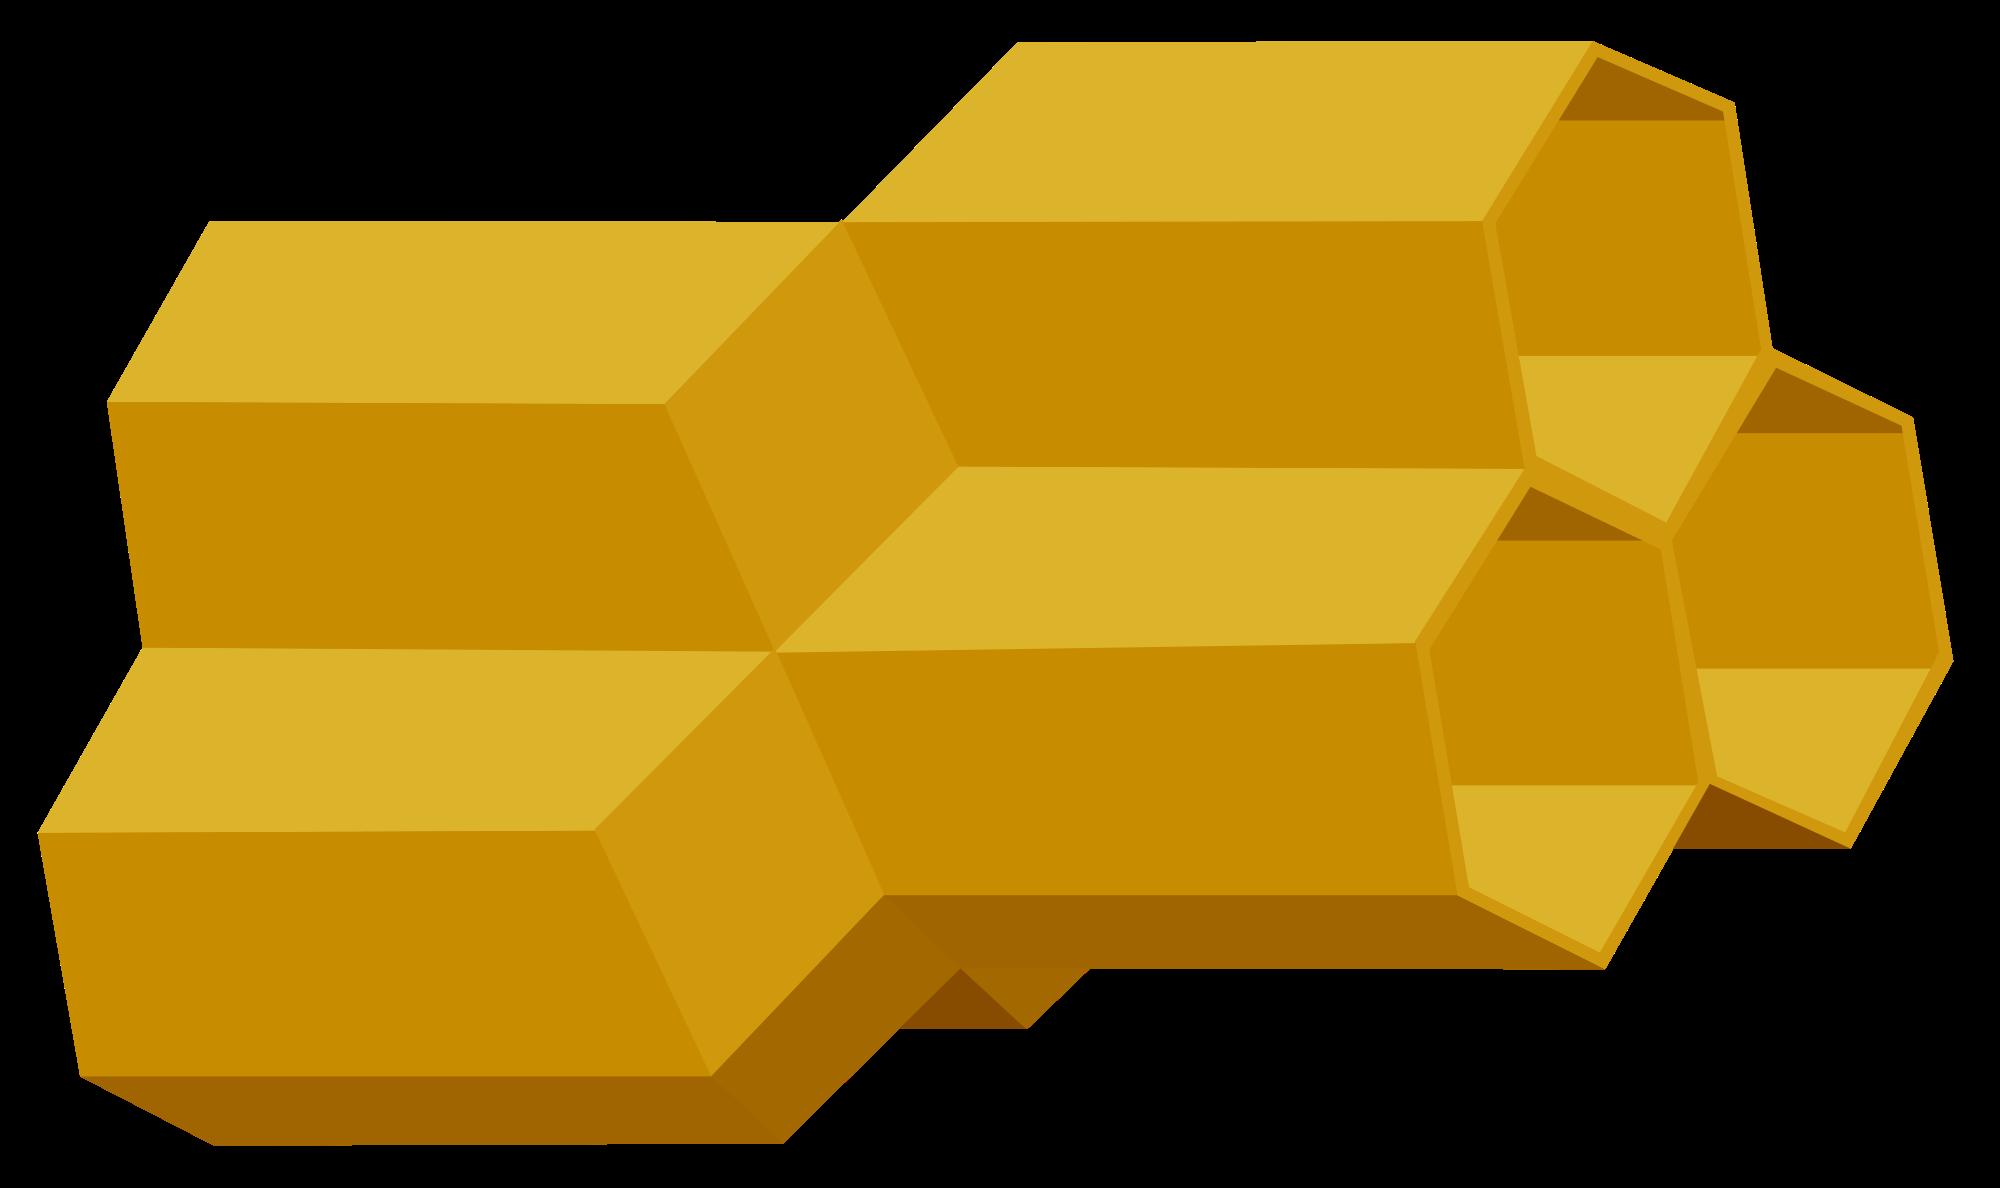 Honeycomb clipart honey comb. File d rot svg